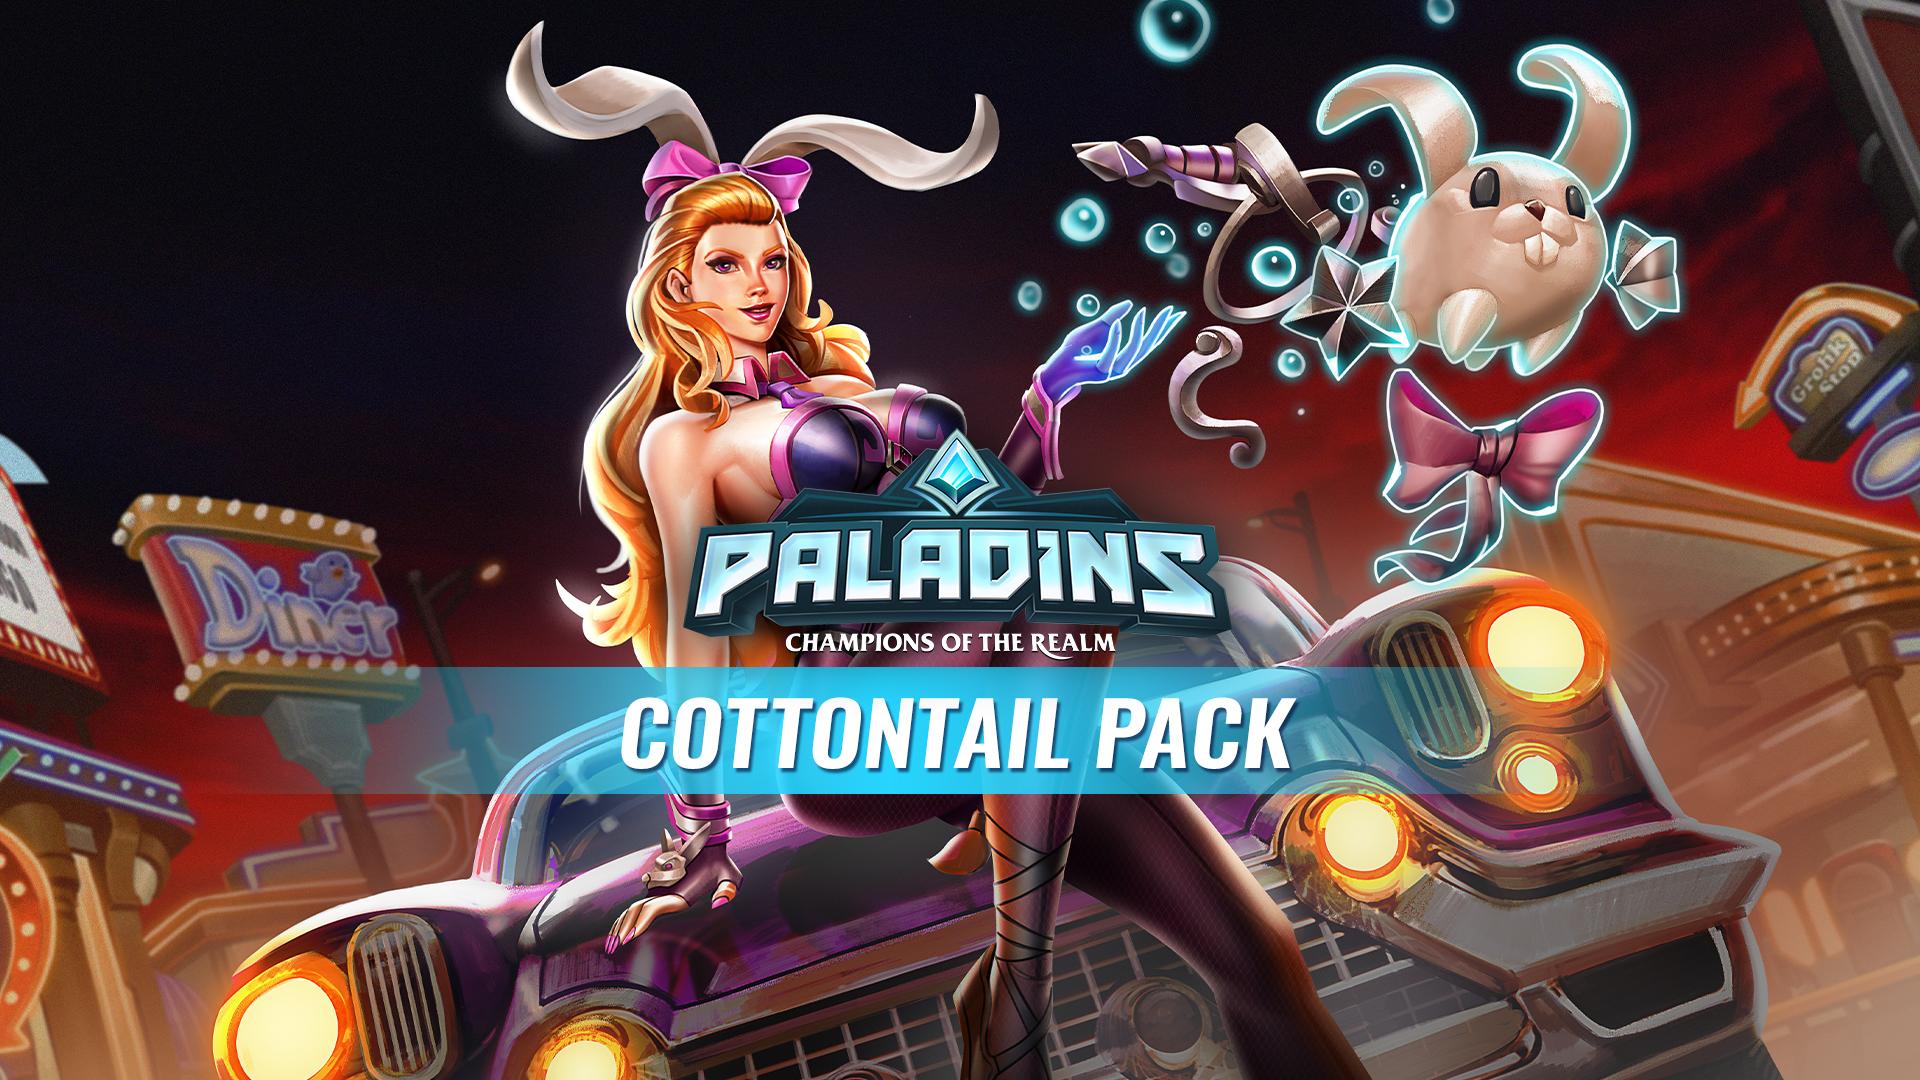 Paladins Digital Deluxe Edition 2019/Paladins/Nintendo Switch/Nintendo